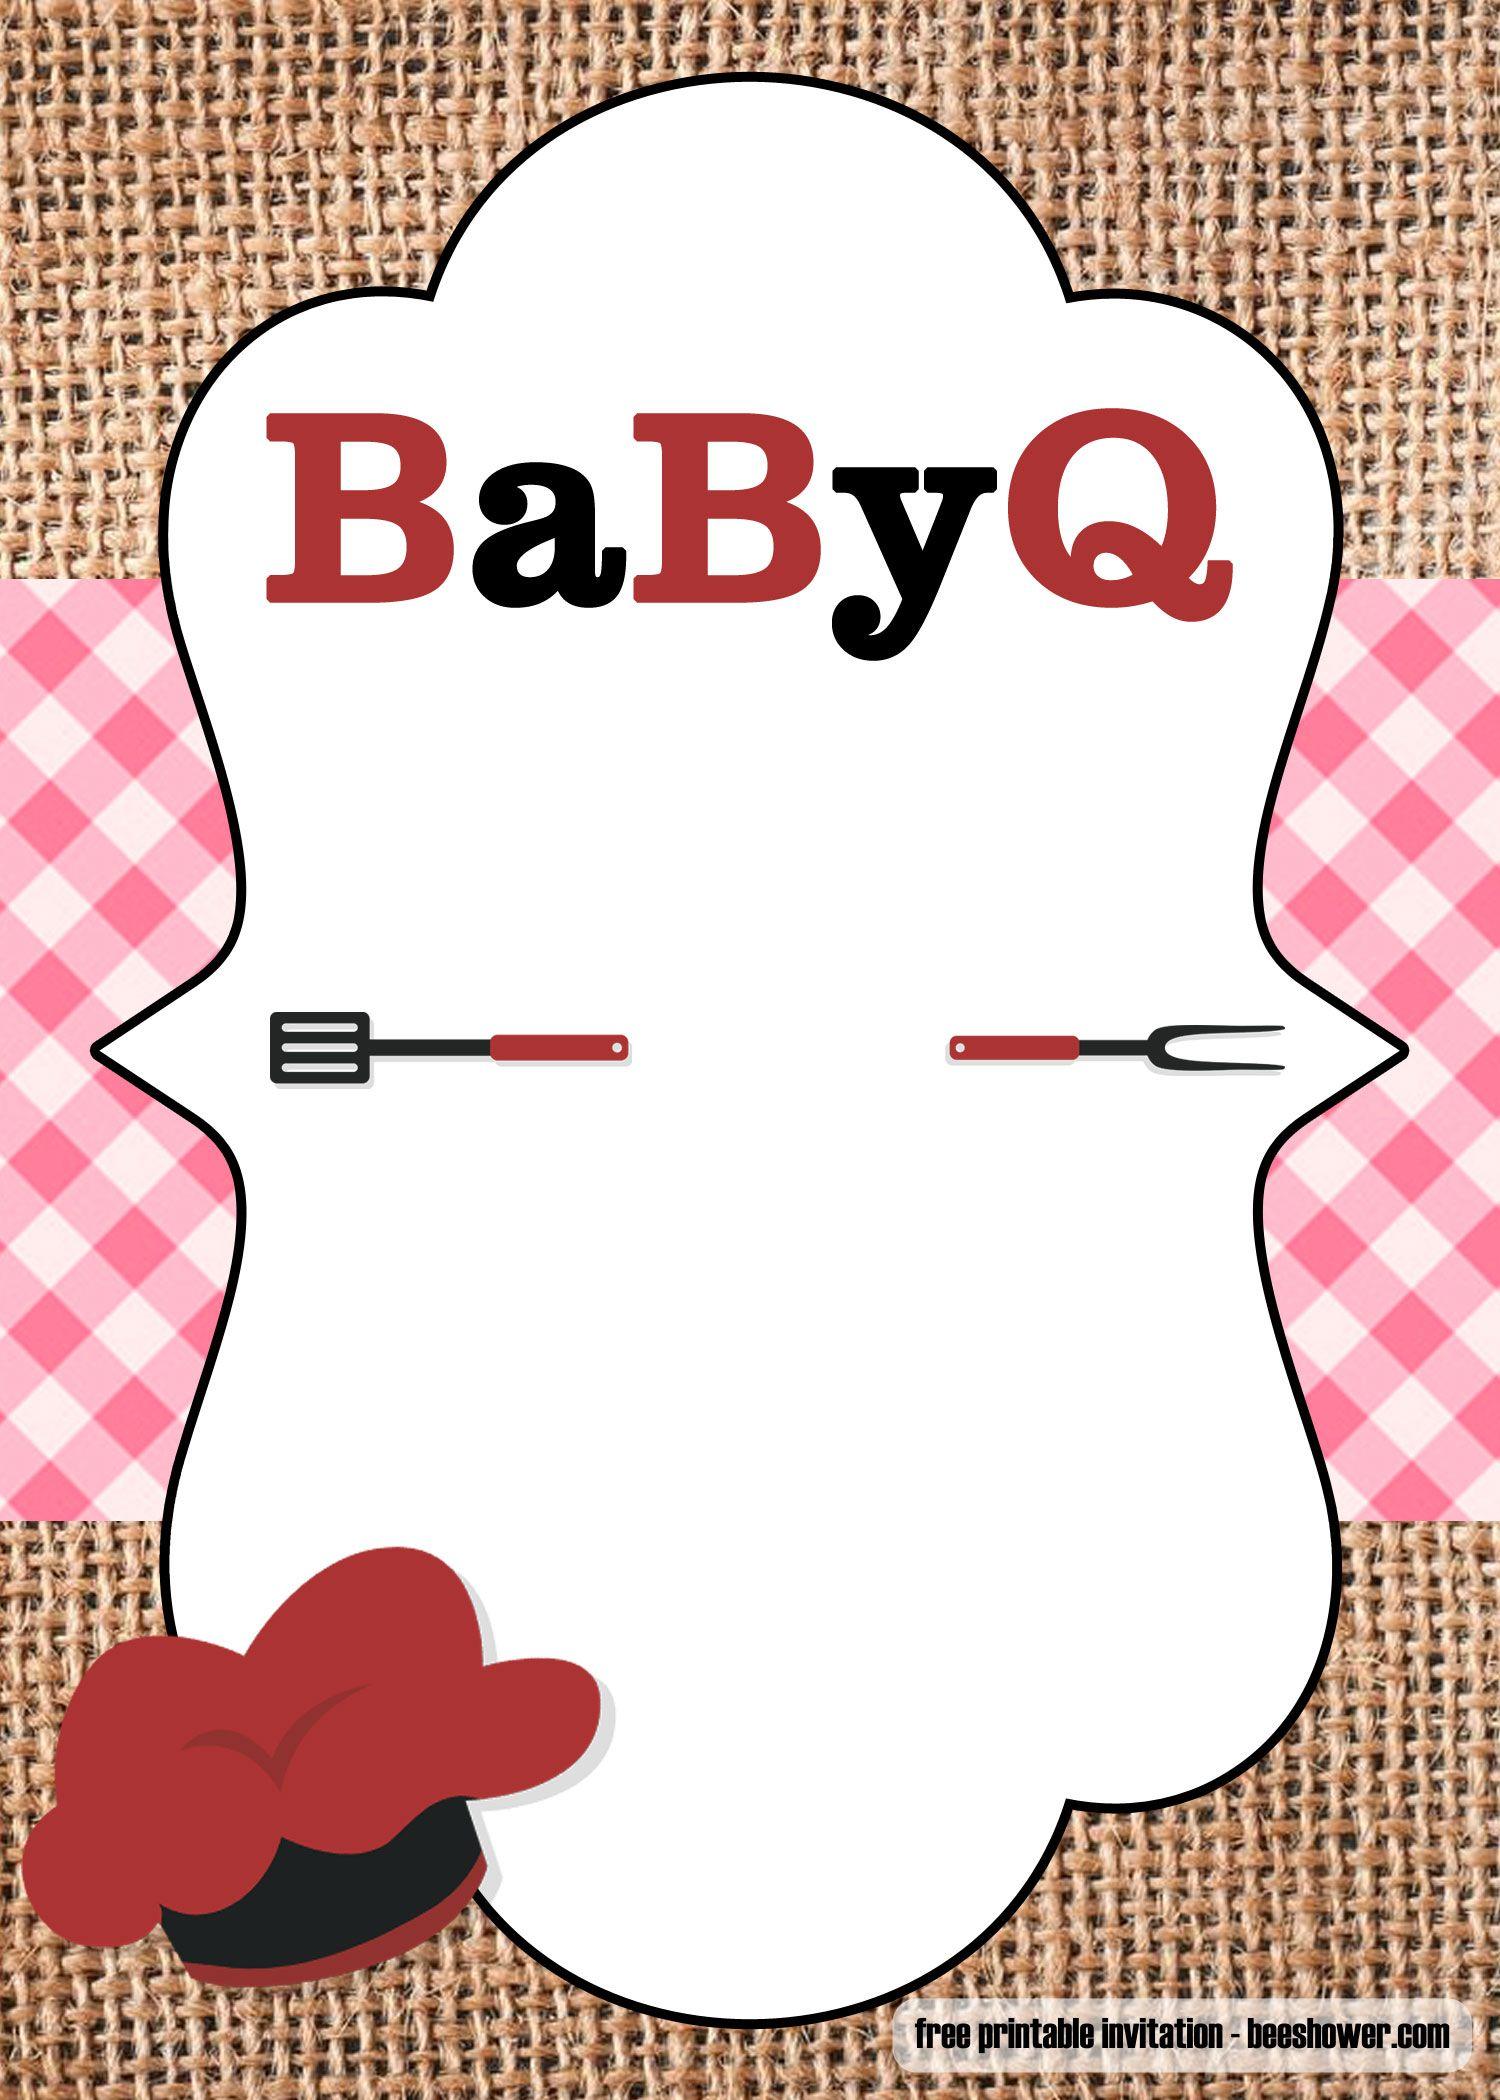 Free Printable Bbq Baby Shower Invitations Templates Bbq Baby Shower Invitations Shower Invitations Free Baby Shower Invitation Templates